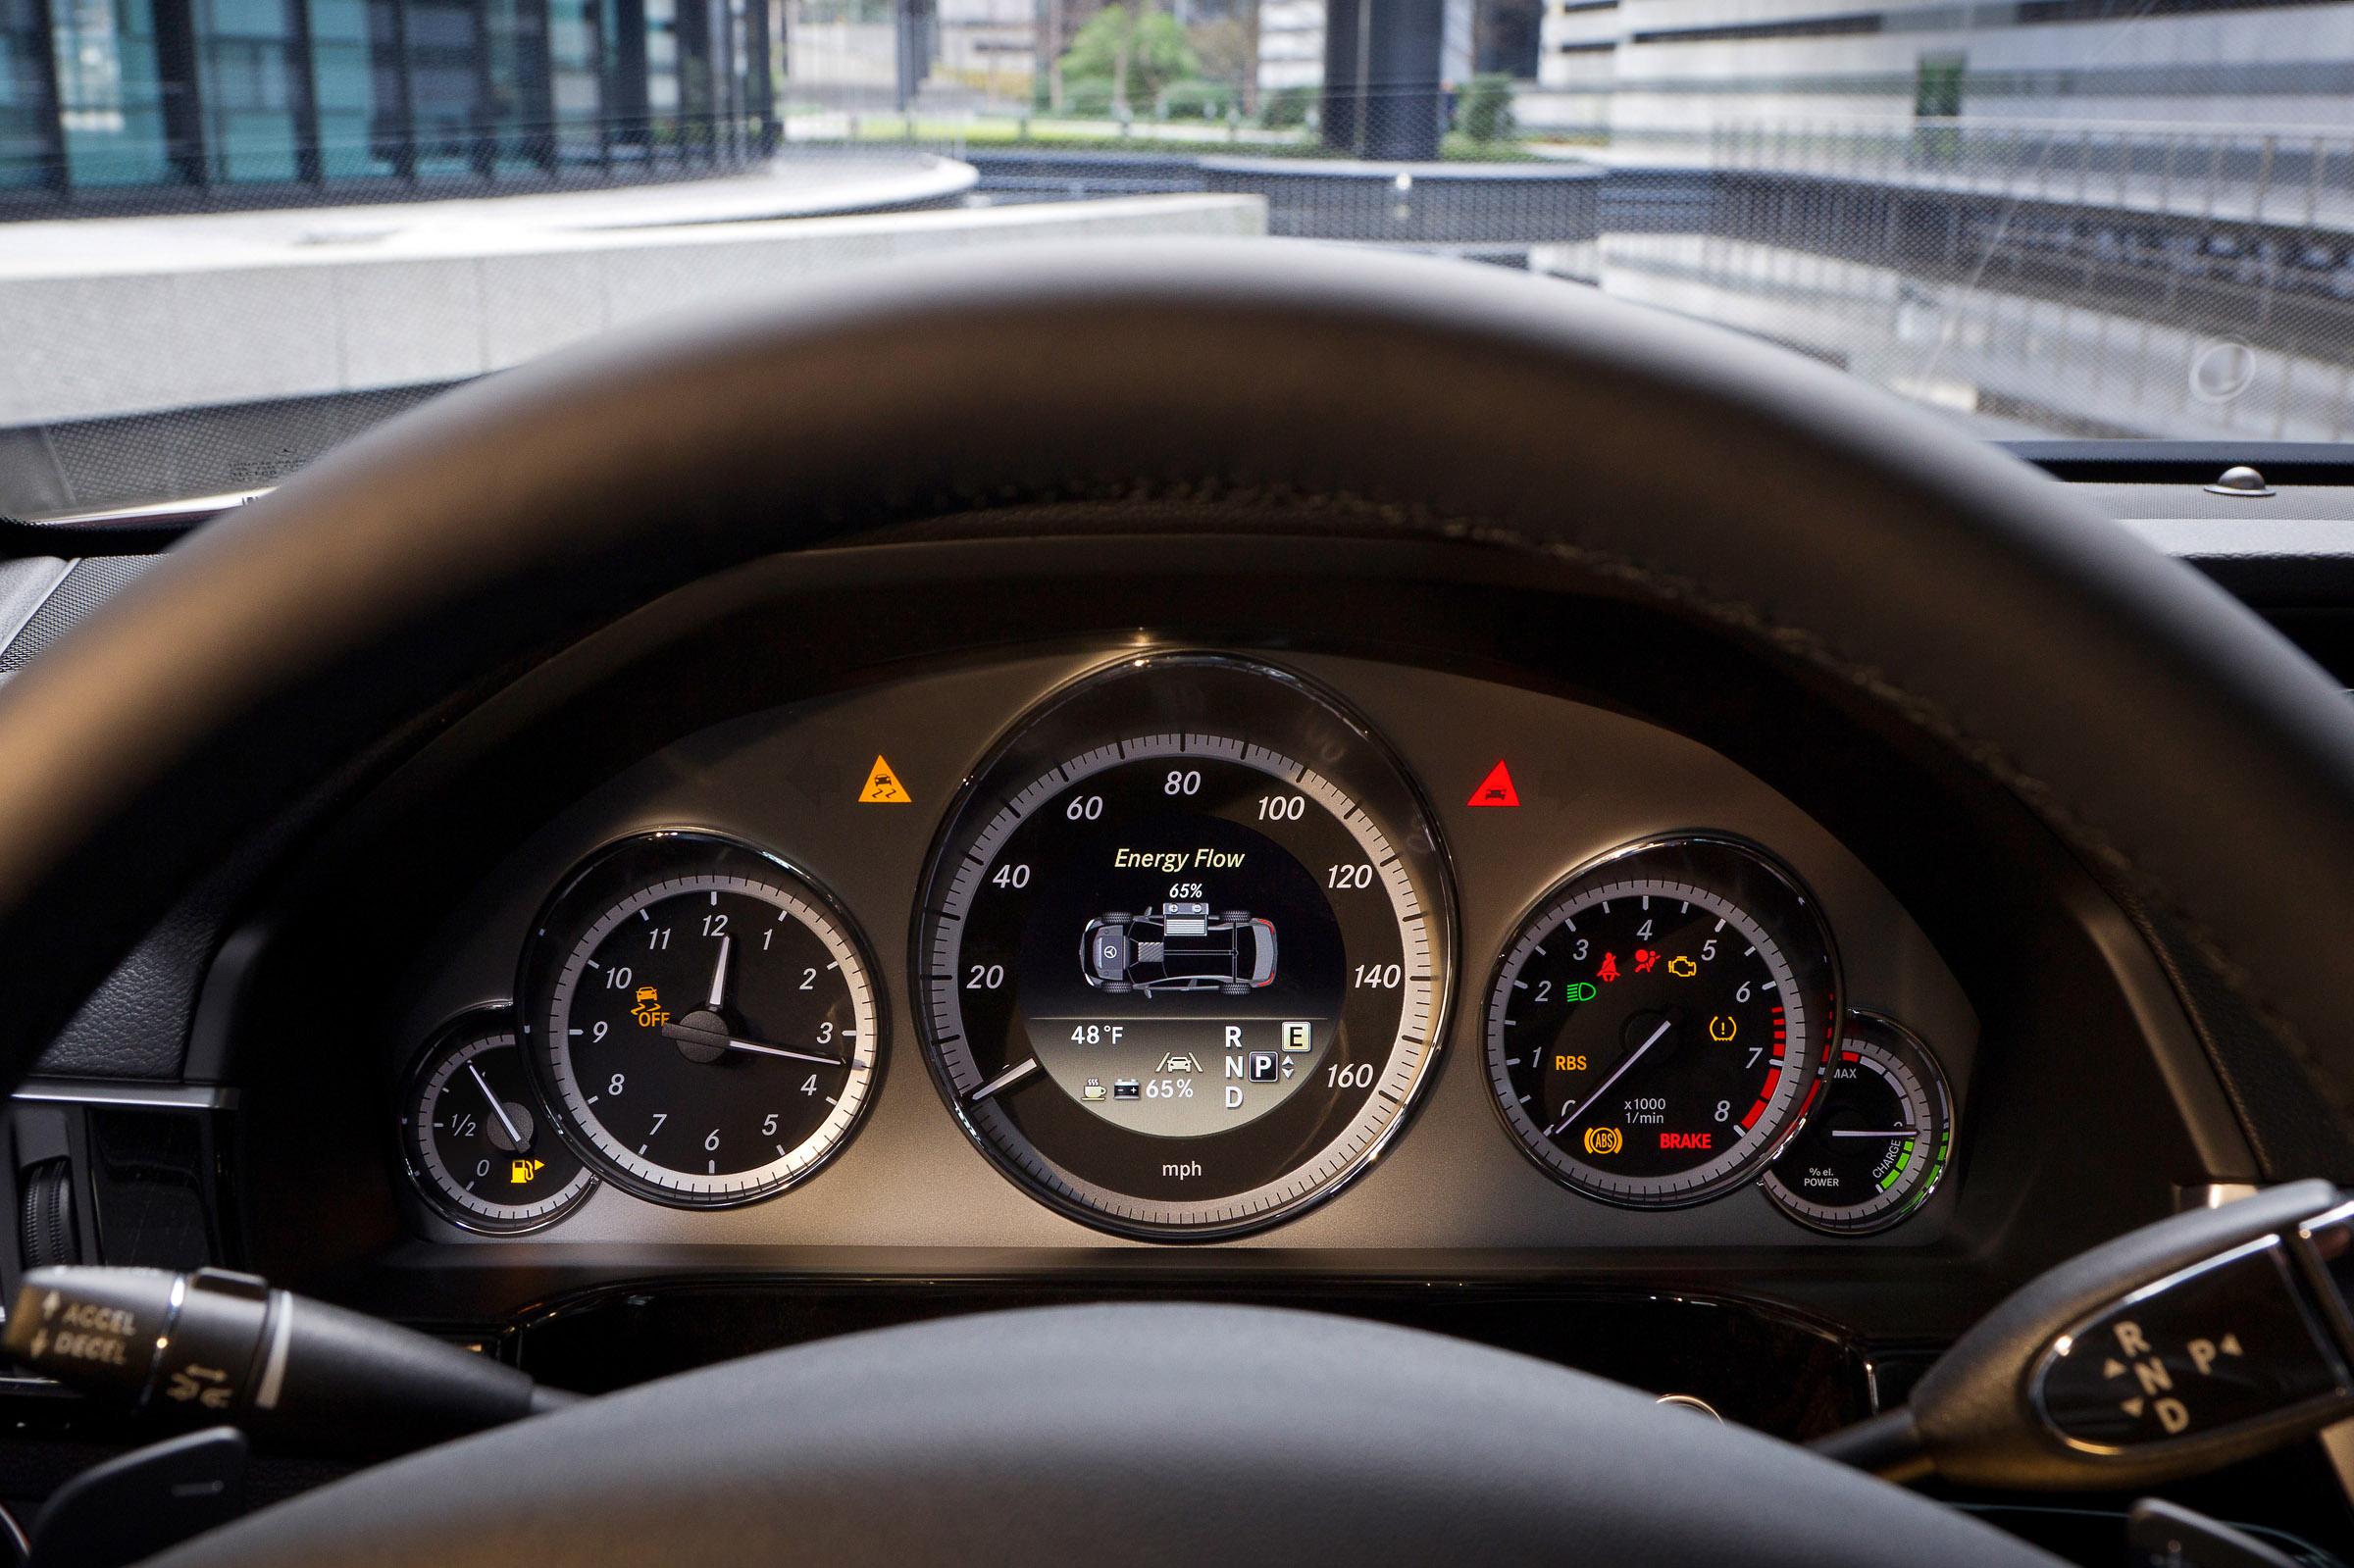 Mercedes-Benz to debut E300 and E400 hybrids in 2012 | Ubergizmo